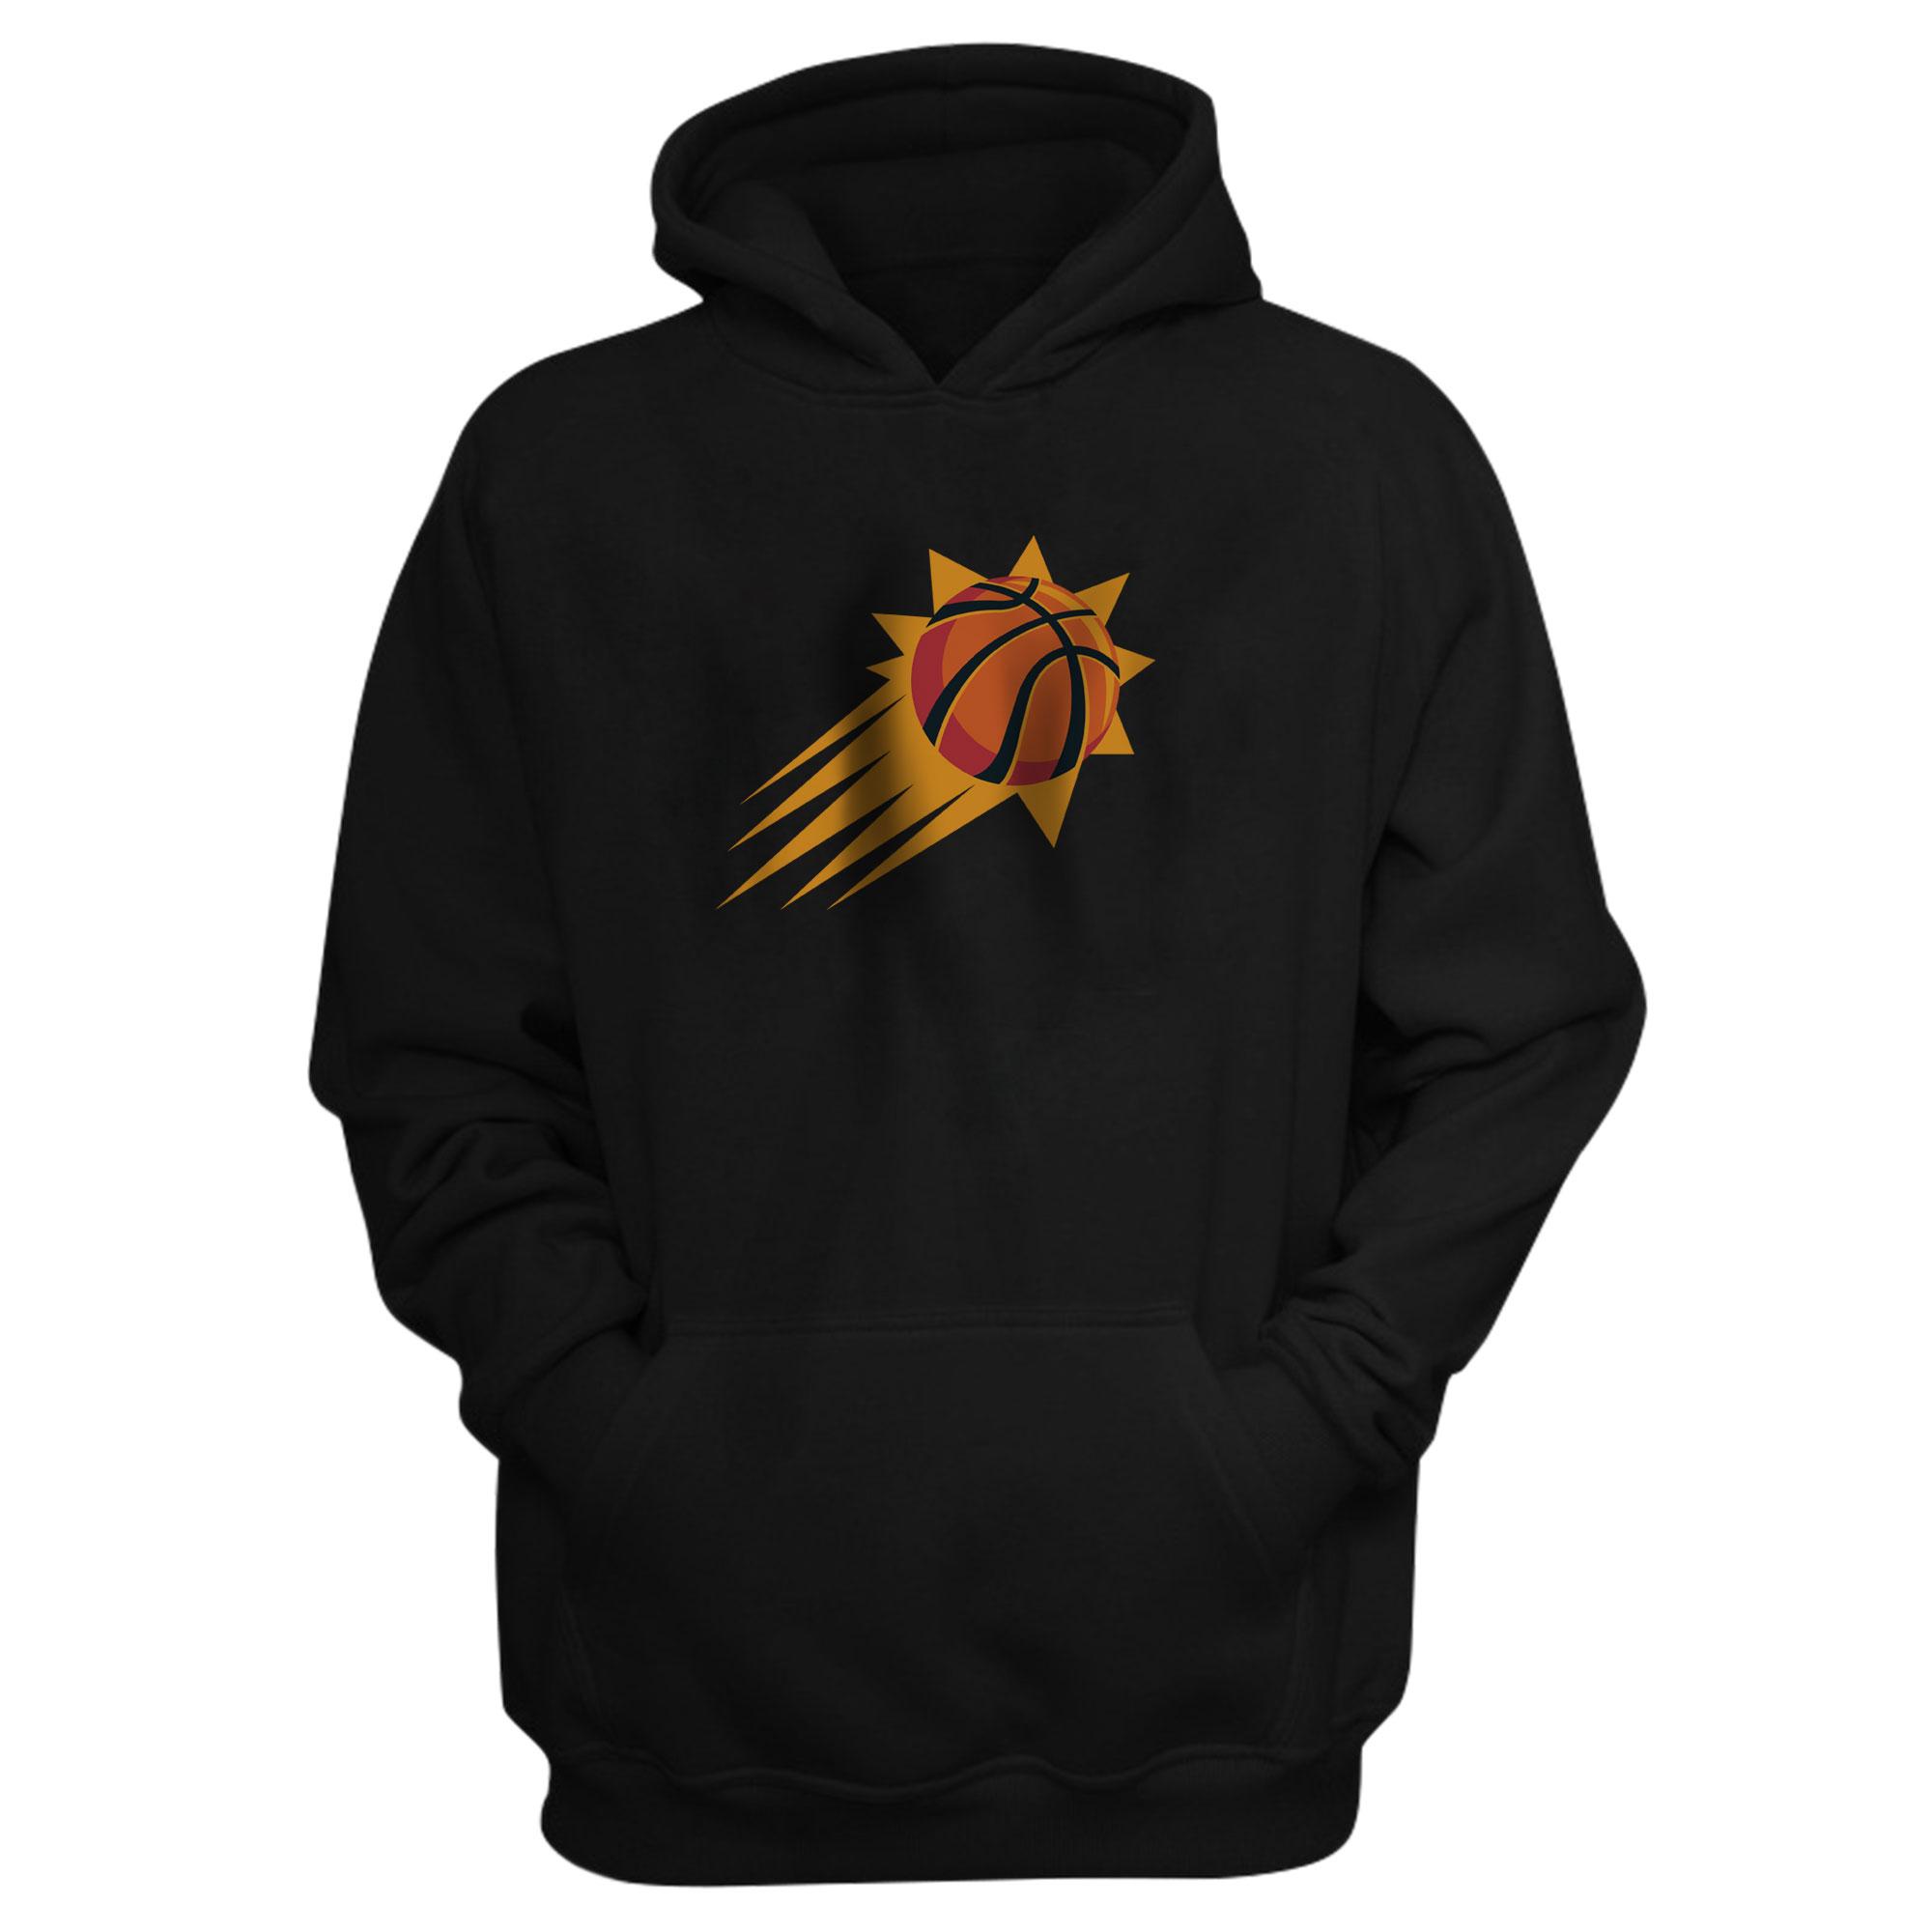 Phoenix Suns Hoodie (HD-BLC-NP-406-NBA-PHO-SUNS.NEW)